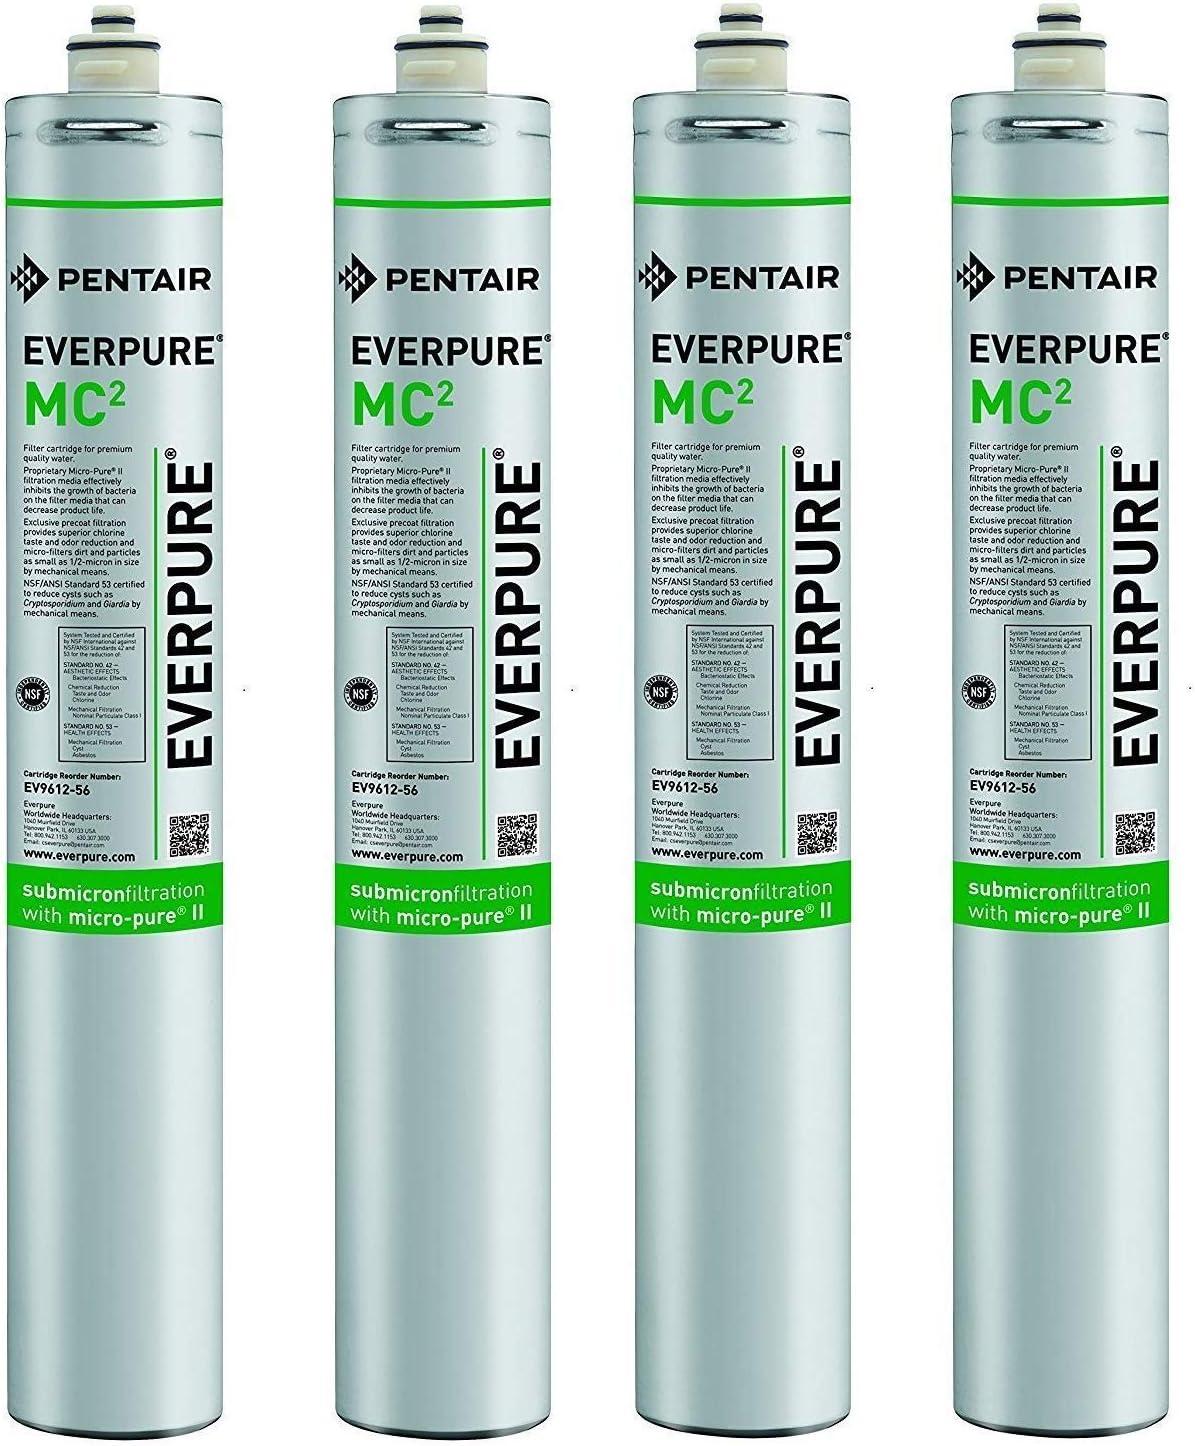 Everpure Spasm price EV961256 Daily bargain sale MC 2 Pack Cart 4 of